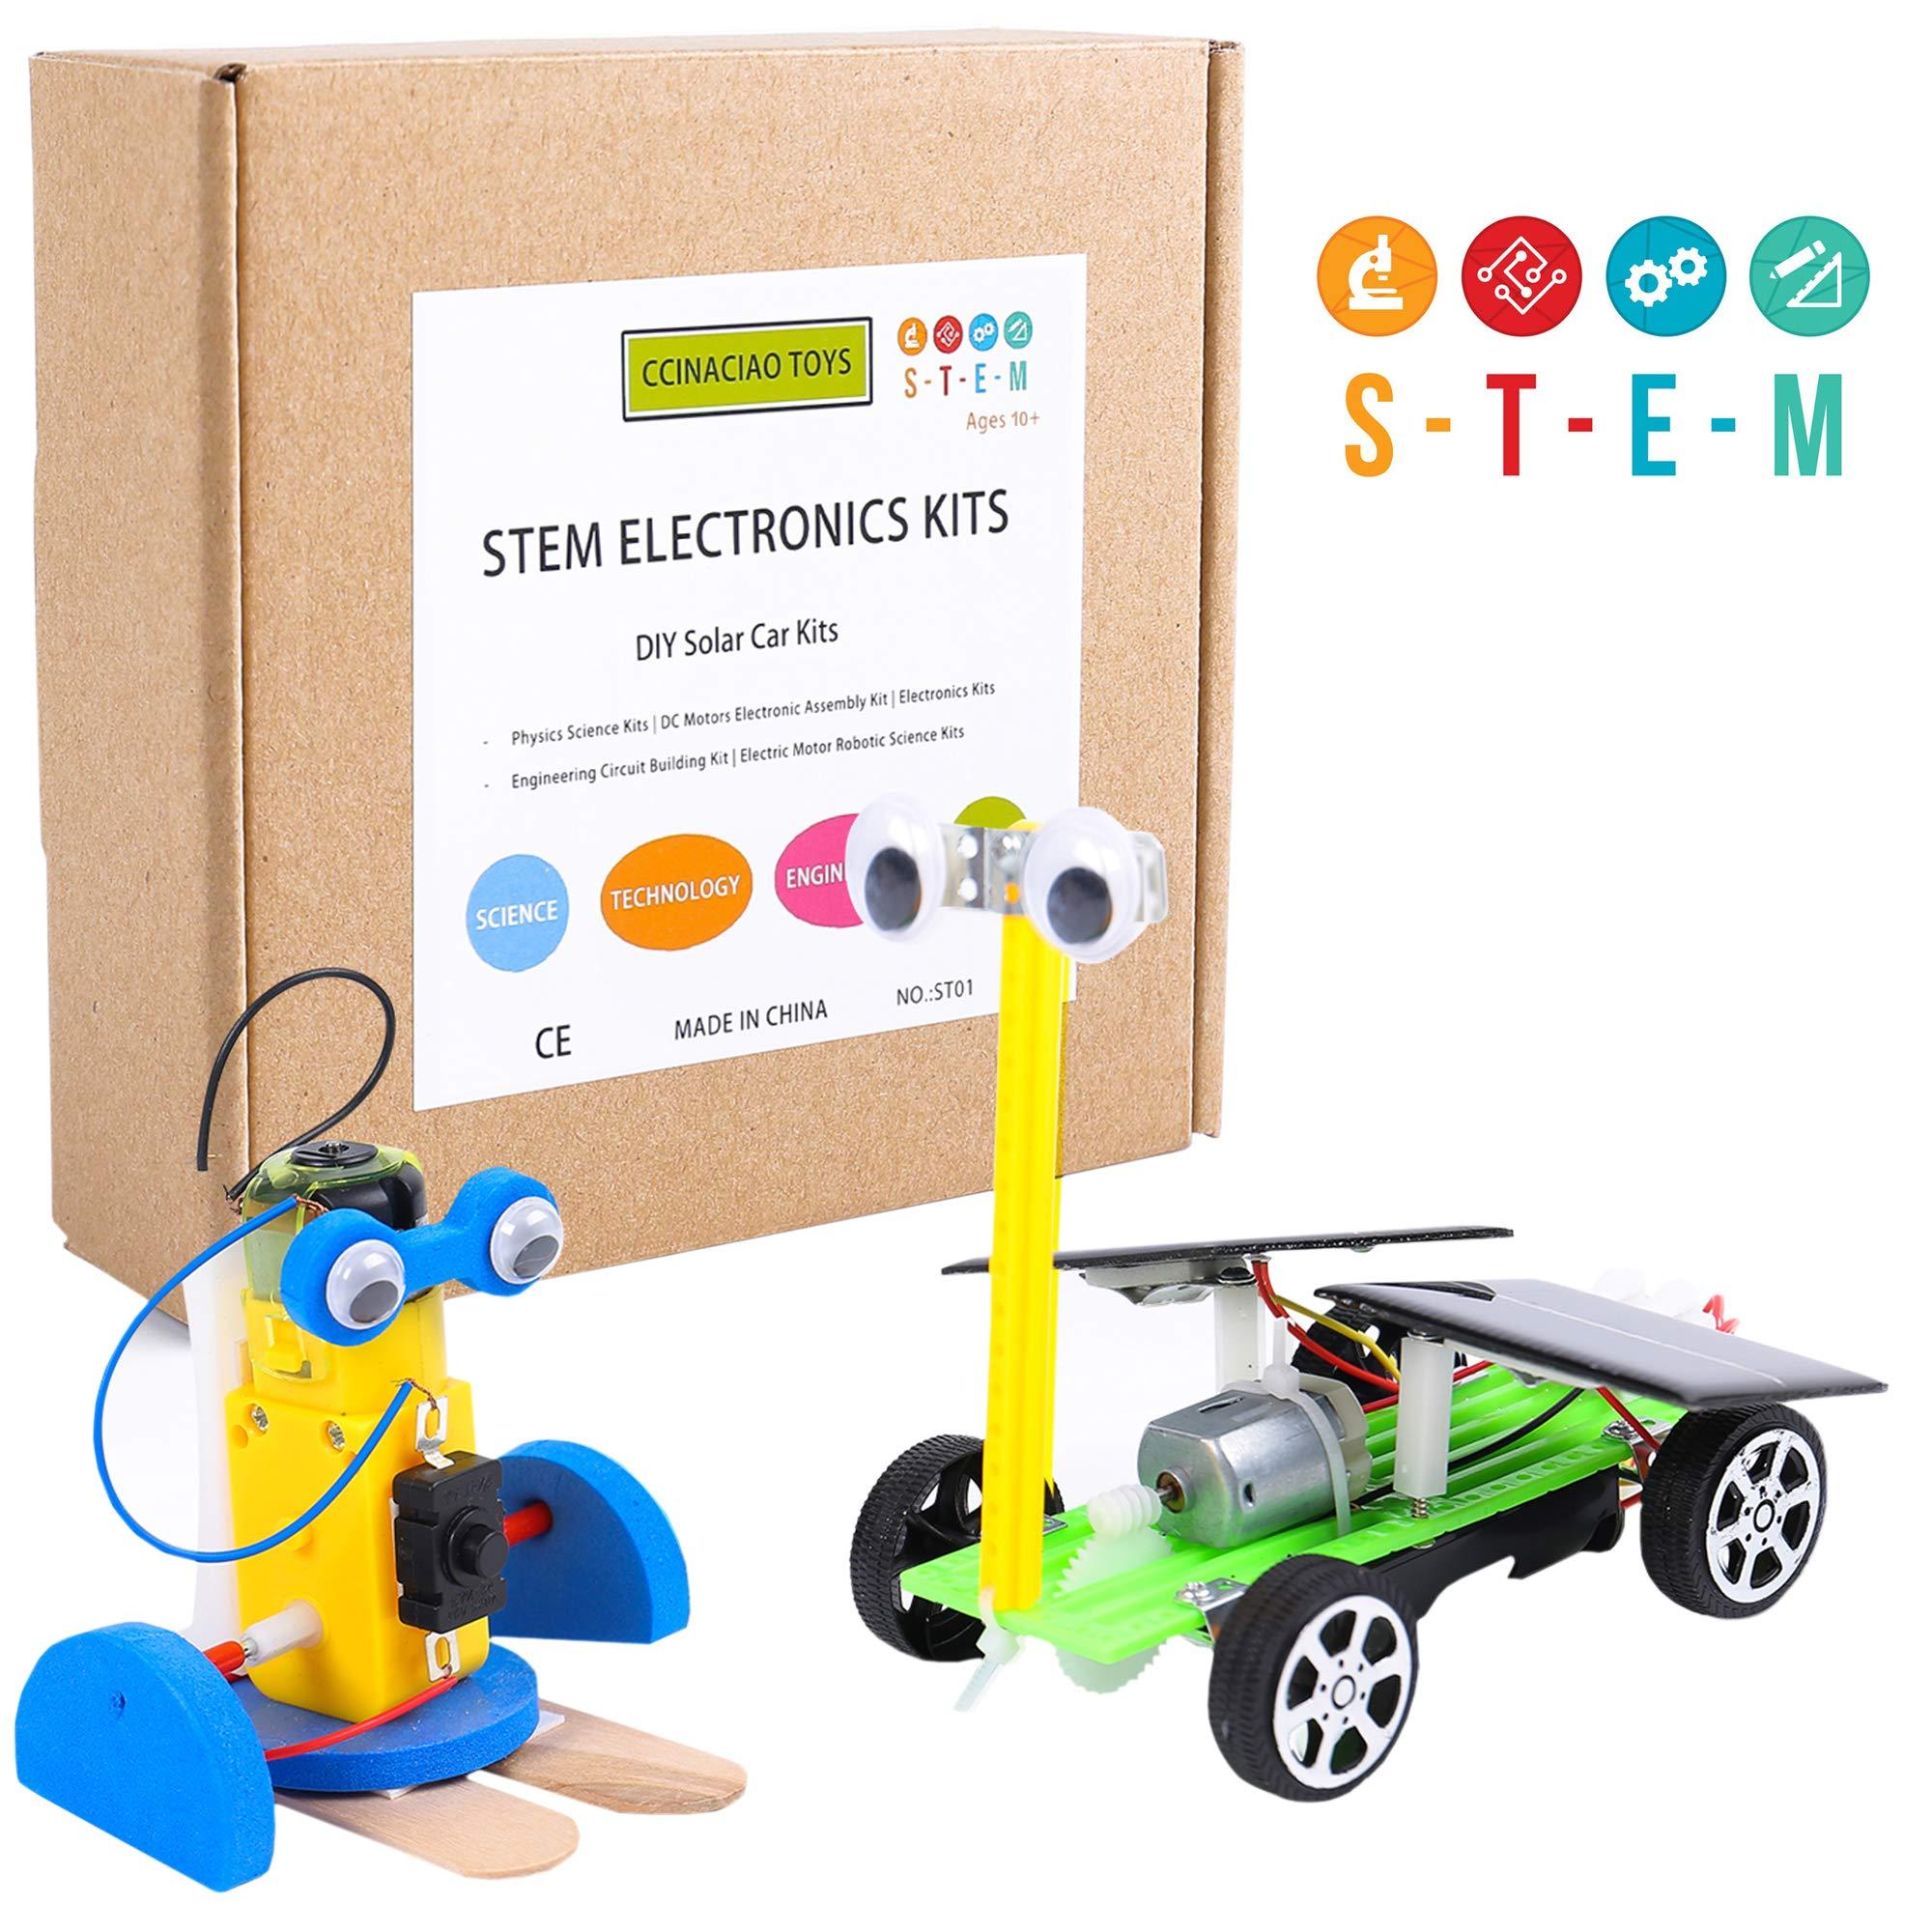 CCinaCiao Robotic Science Kits, DC Motors Electronic Assembly Kit, DIY Solar Car Kits, STEM Kits for Boys and Girls, Kids Science Experiment Kits(2 Kits)